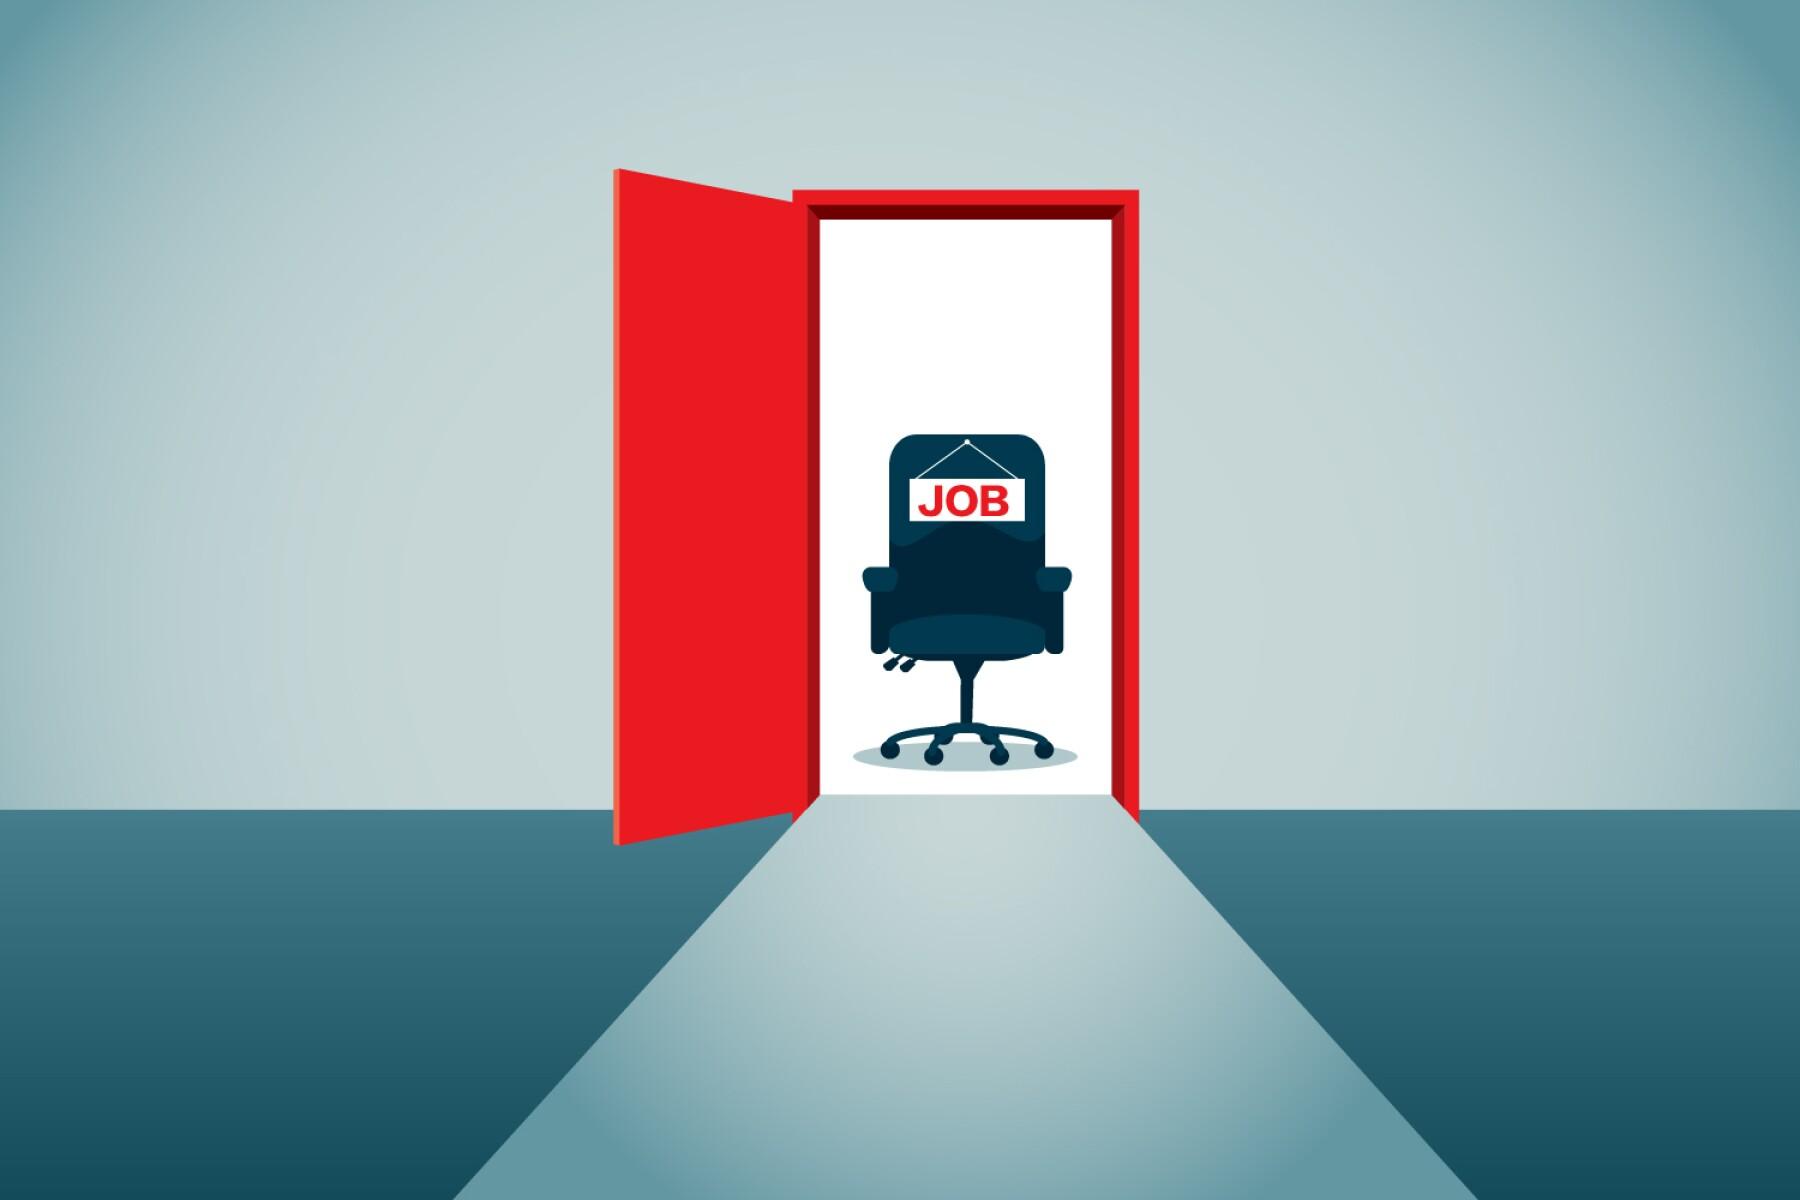 Hiring Picks Up, But Many Still Remain Unemployed